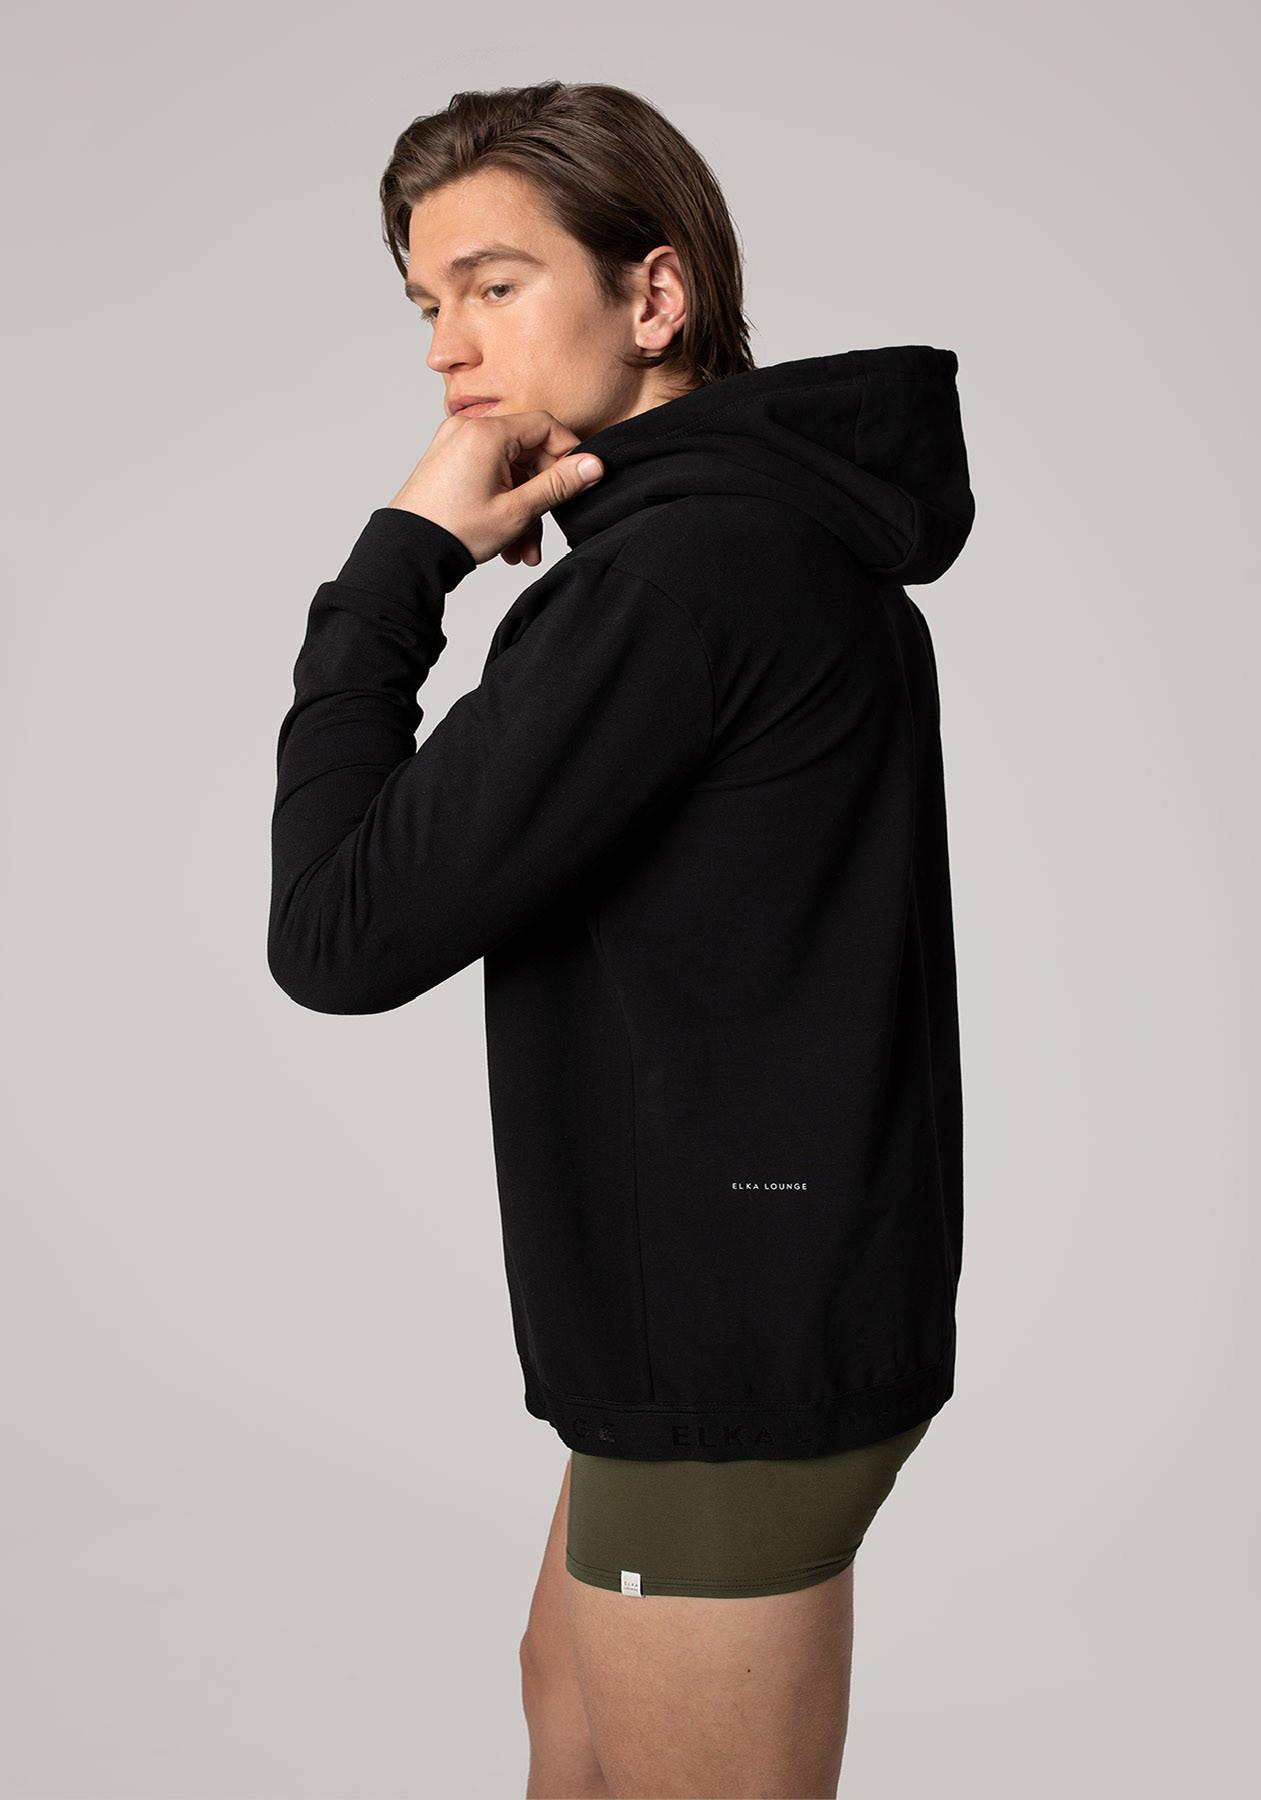 Men-Sweatshirt-ELKA-Lounge-M00574-1